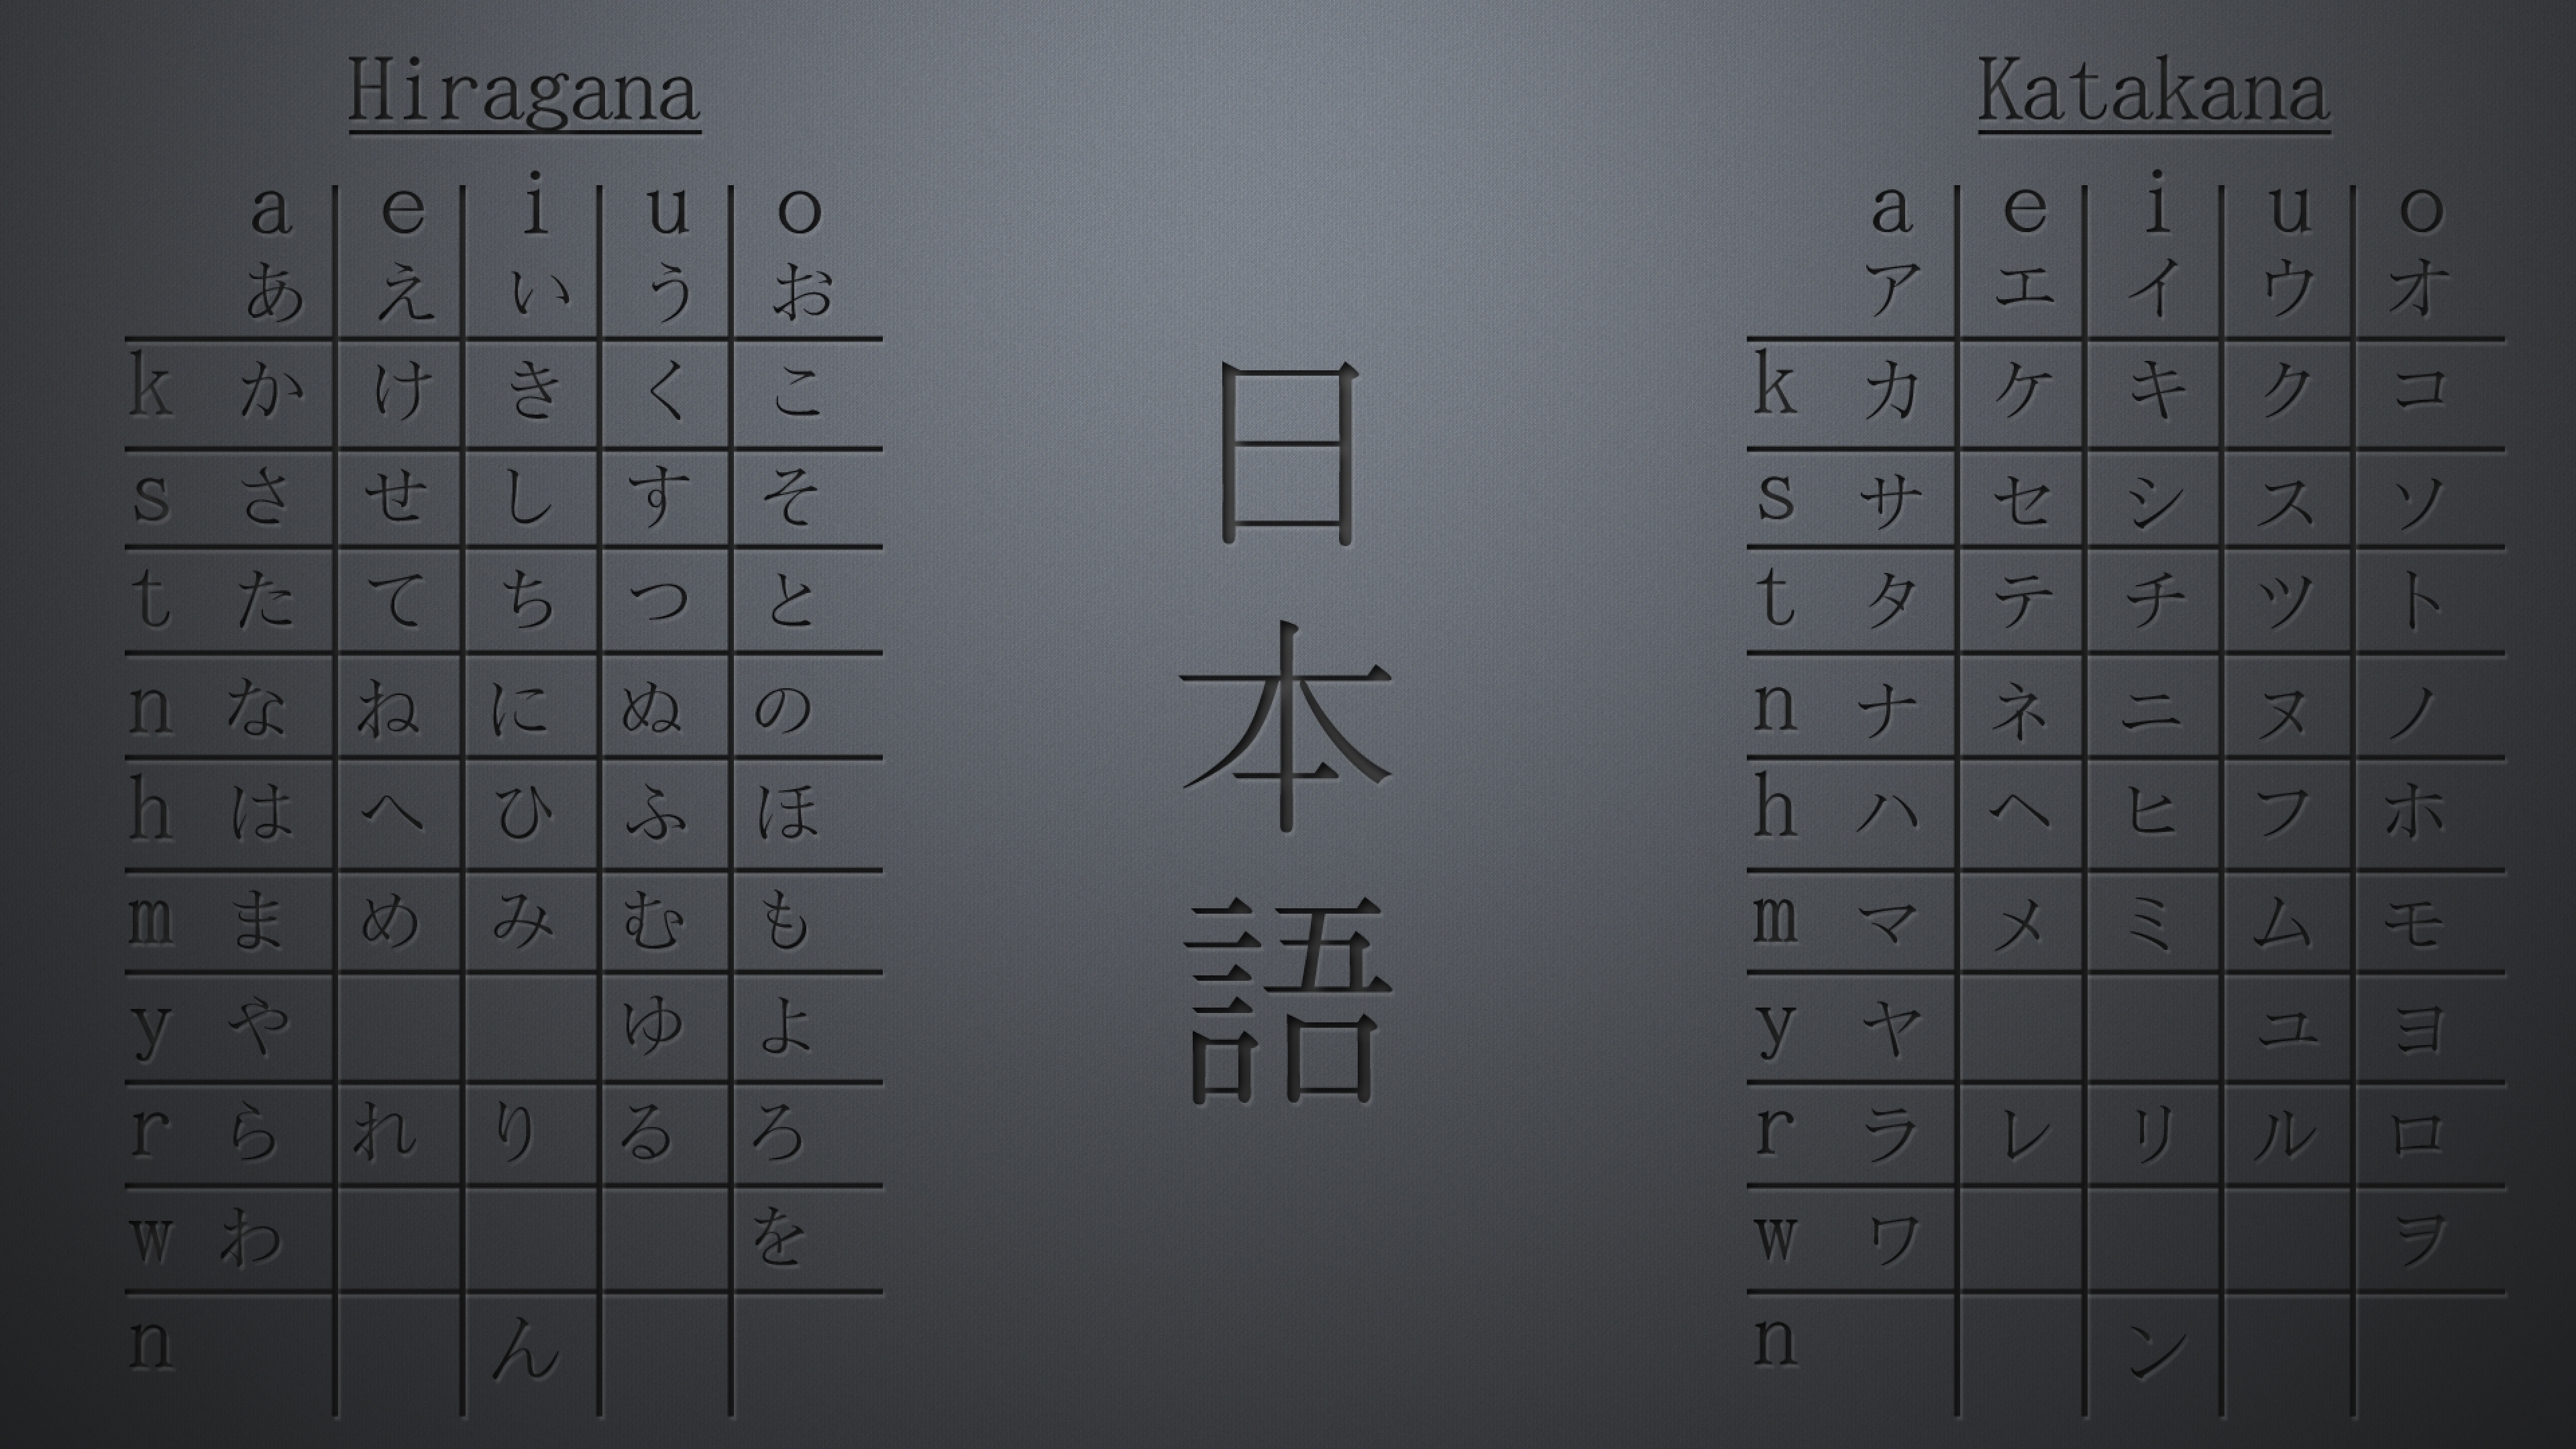 3 japan hiragana